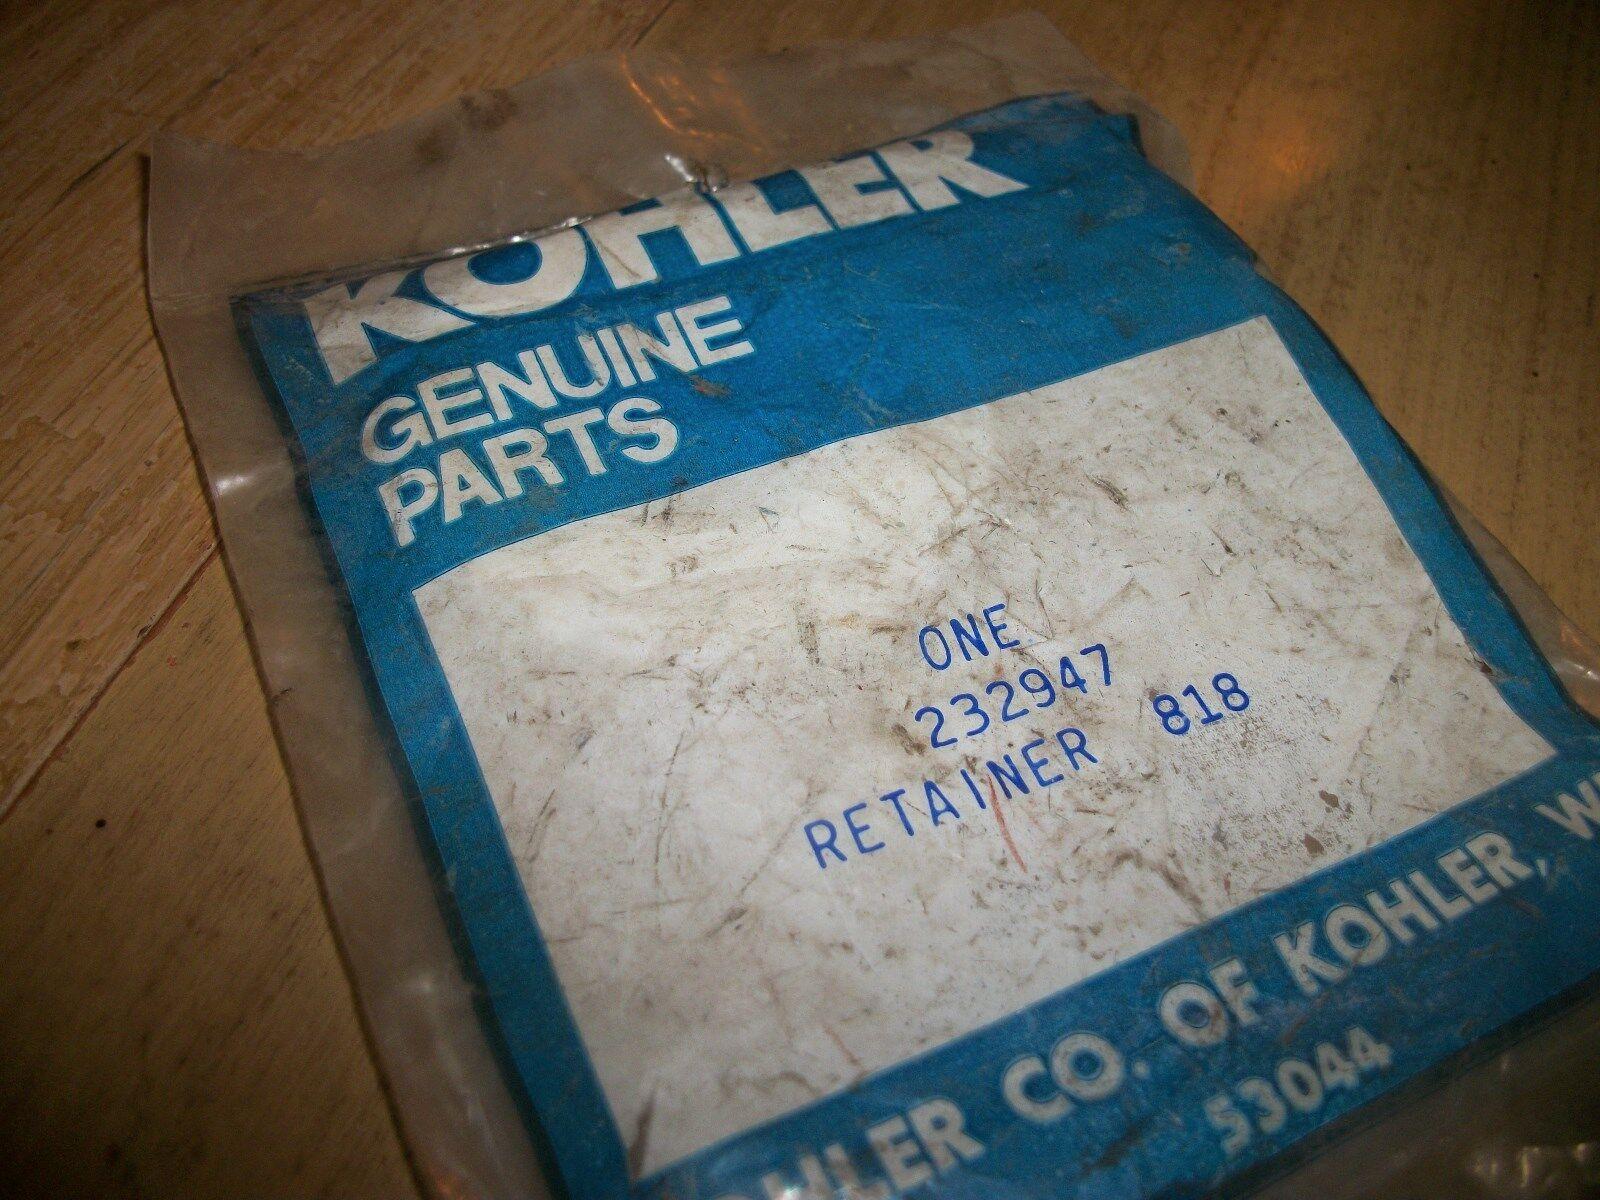 KOHLER  retenedor   232947 Nuevo fabricante de equipo original